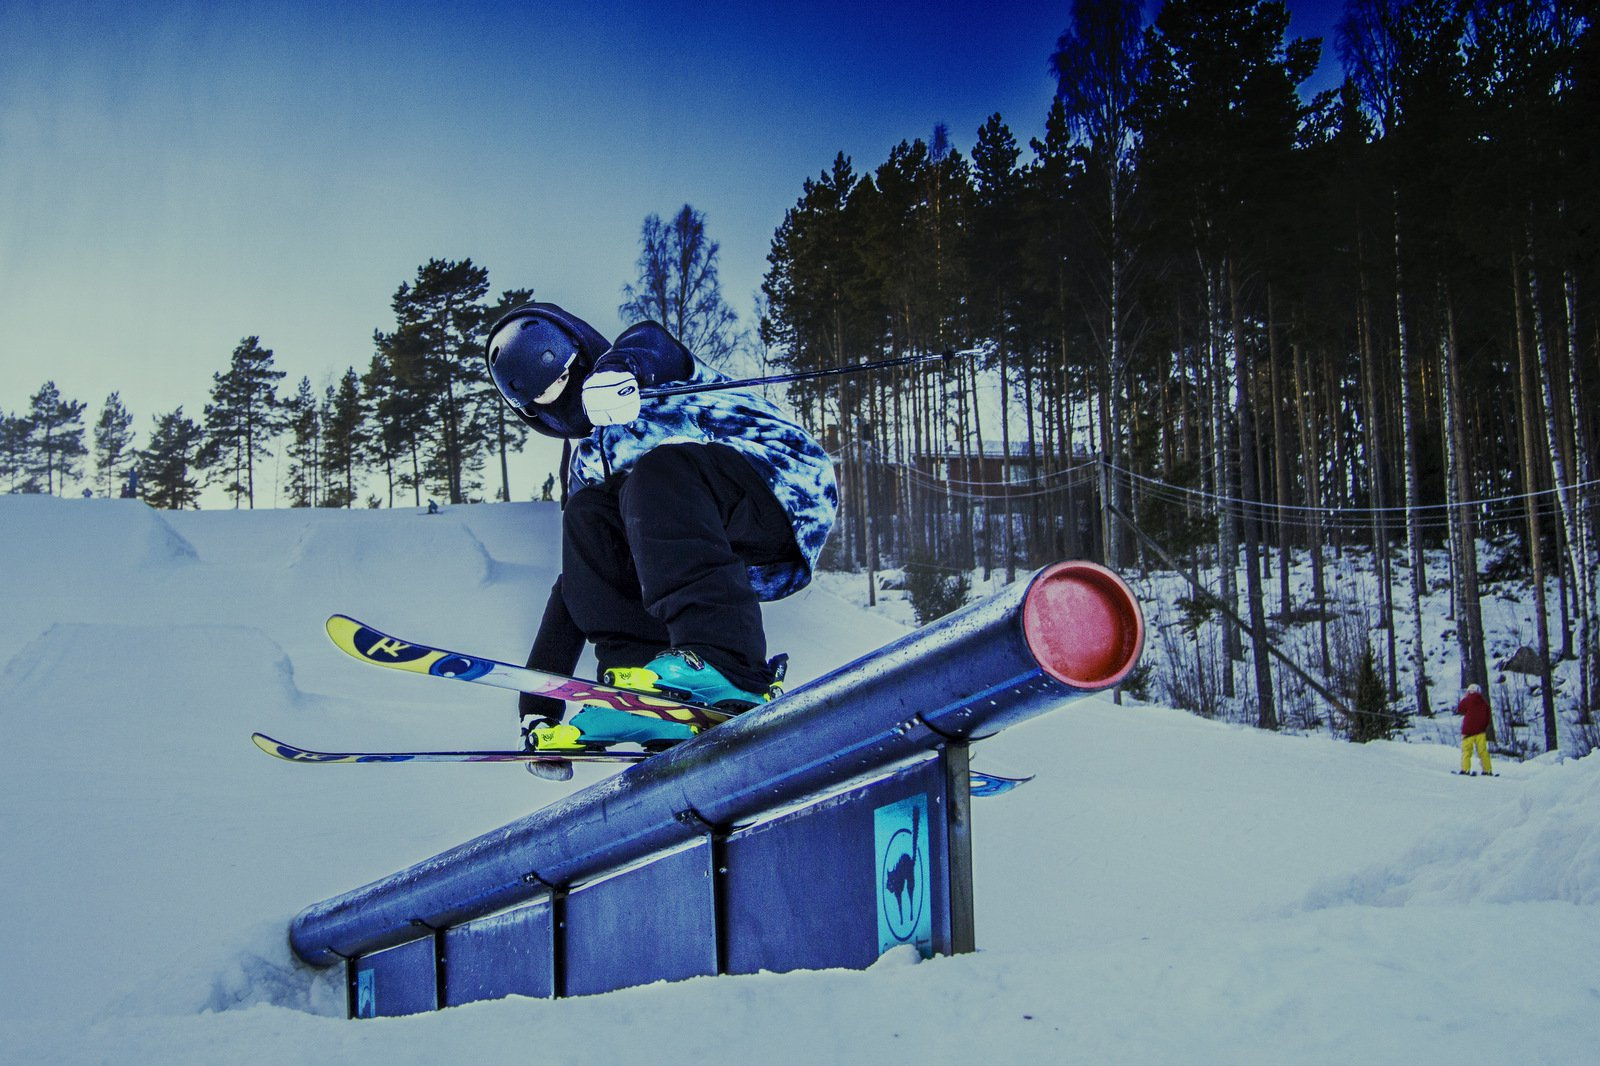 Hitting that rail